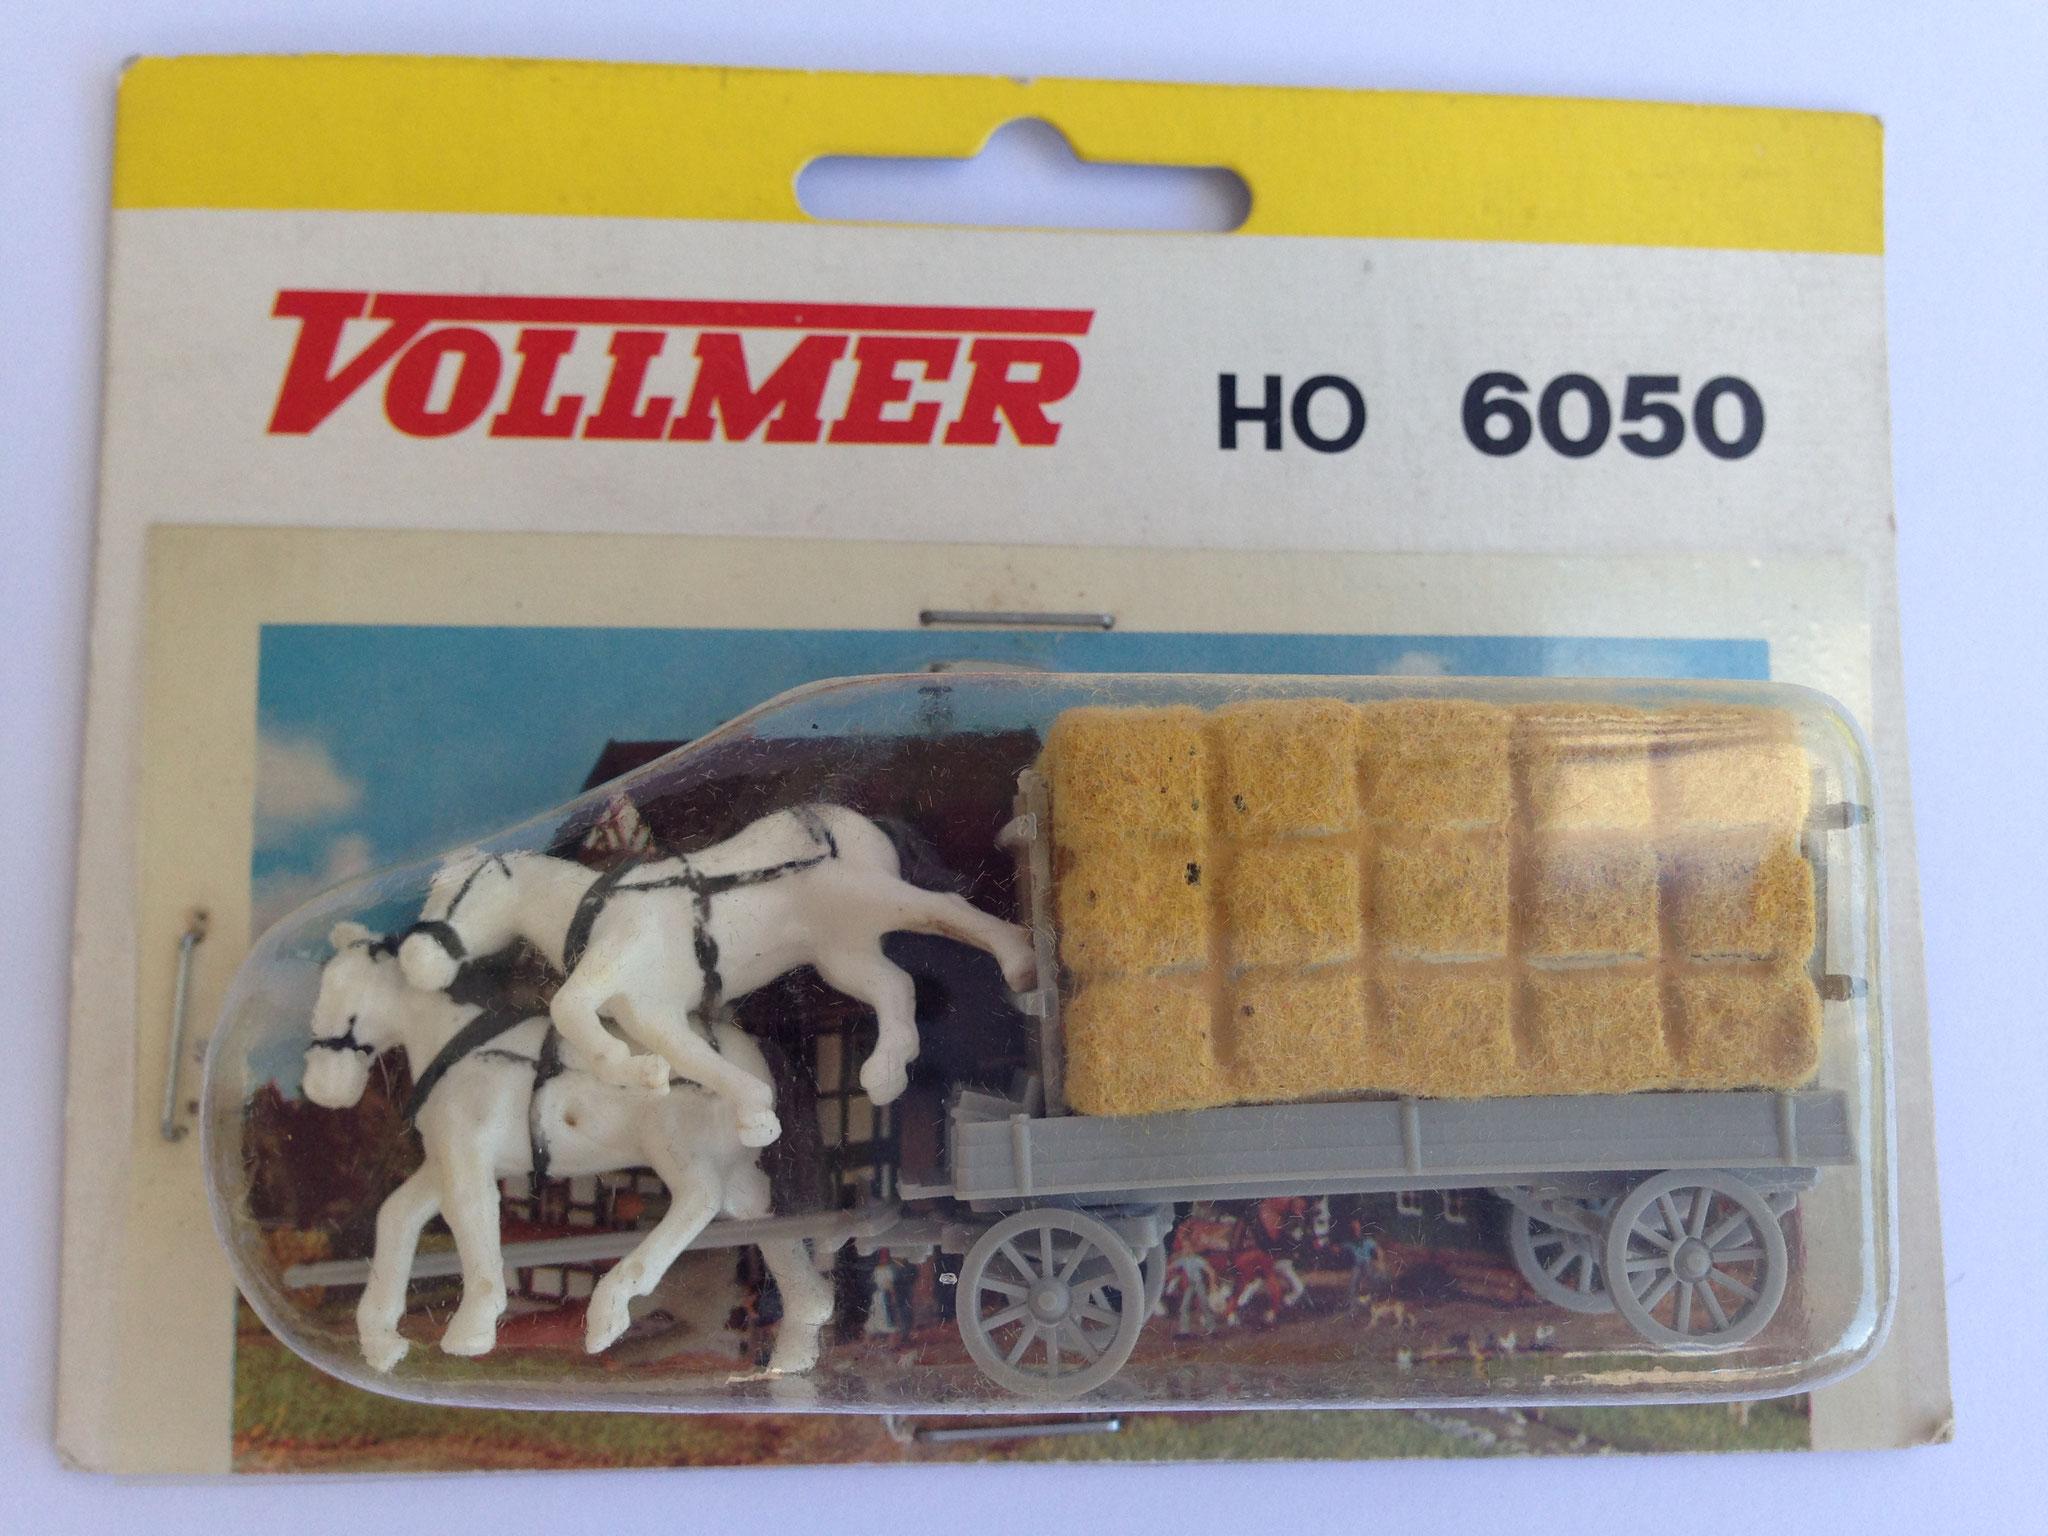 Nr. 6050 Rollwagen mit Beladung, marschierende Pferde